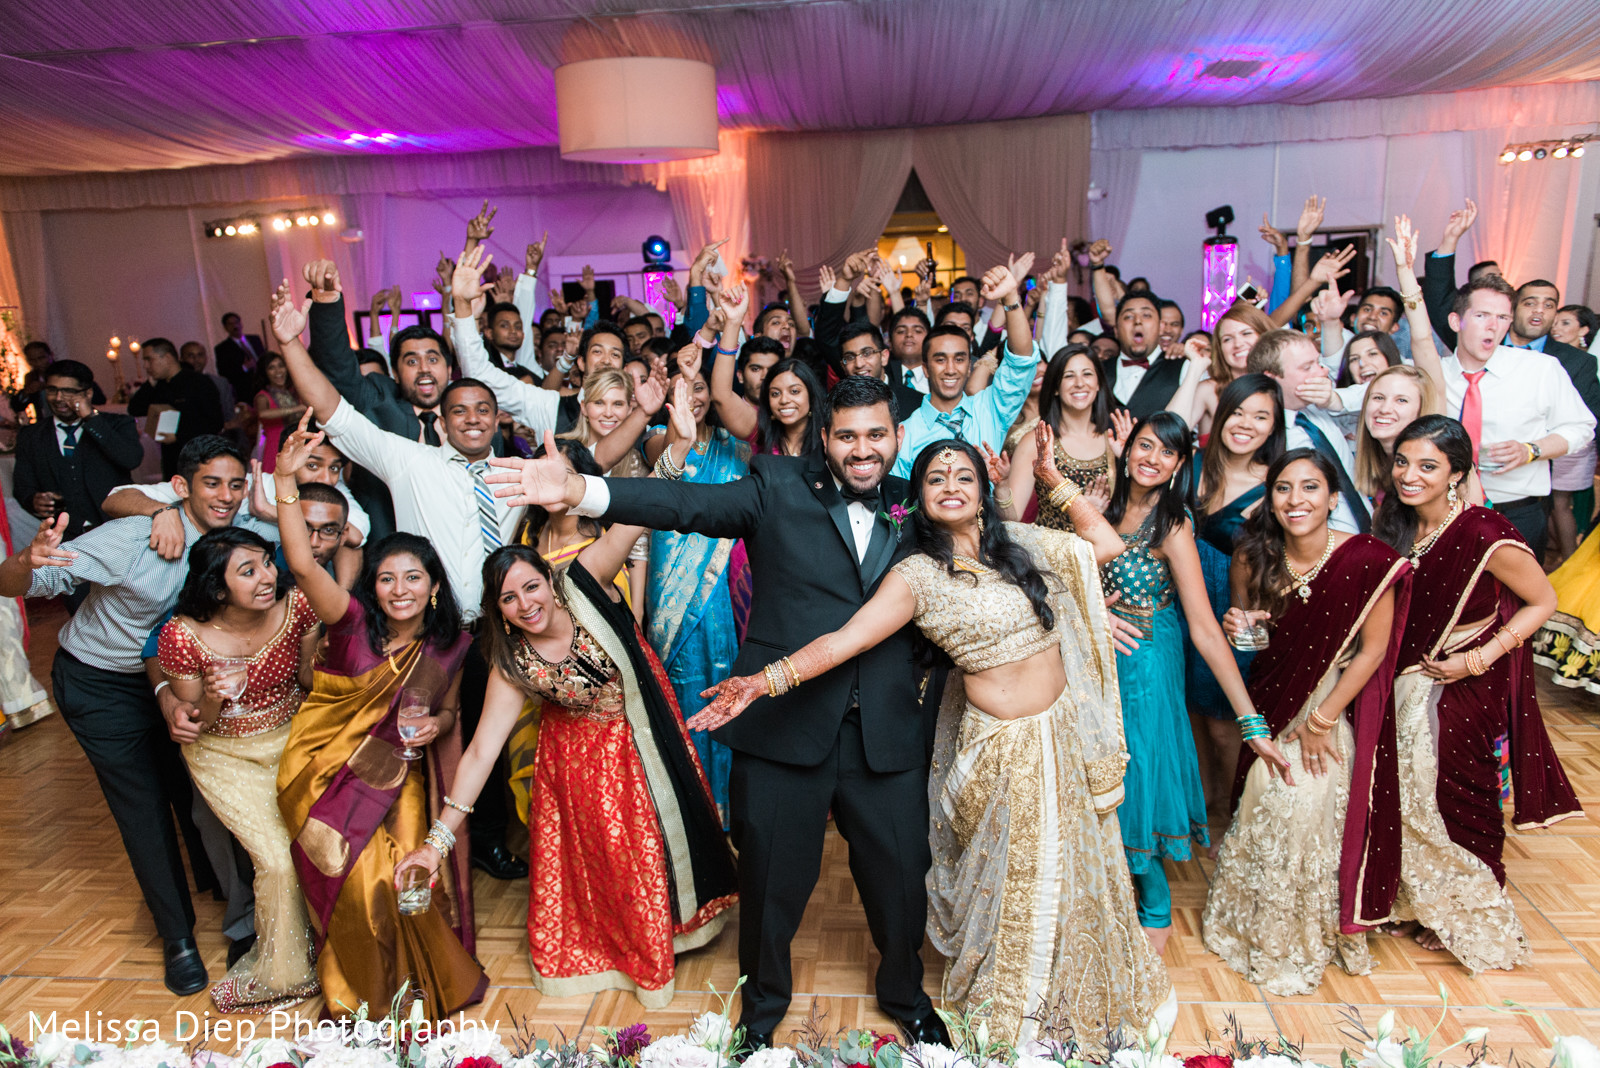 Reception Ceremony In Hindi: Photo 50550